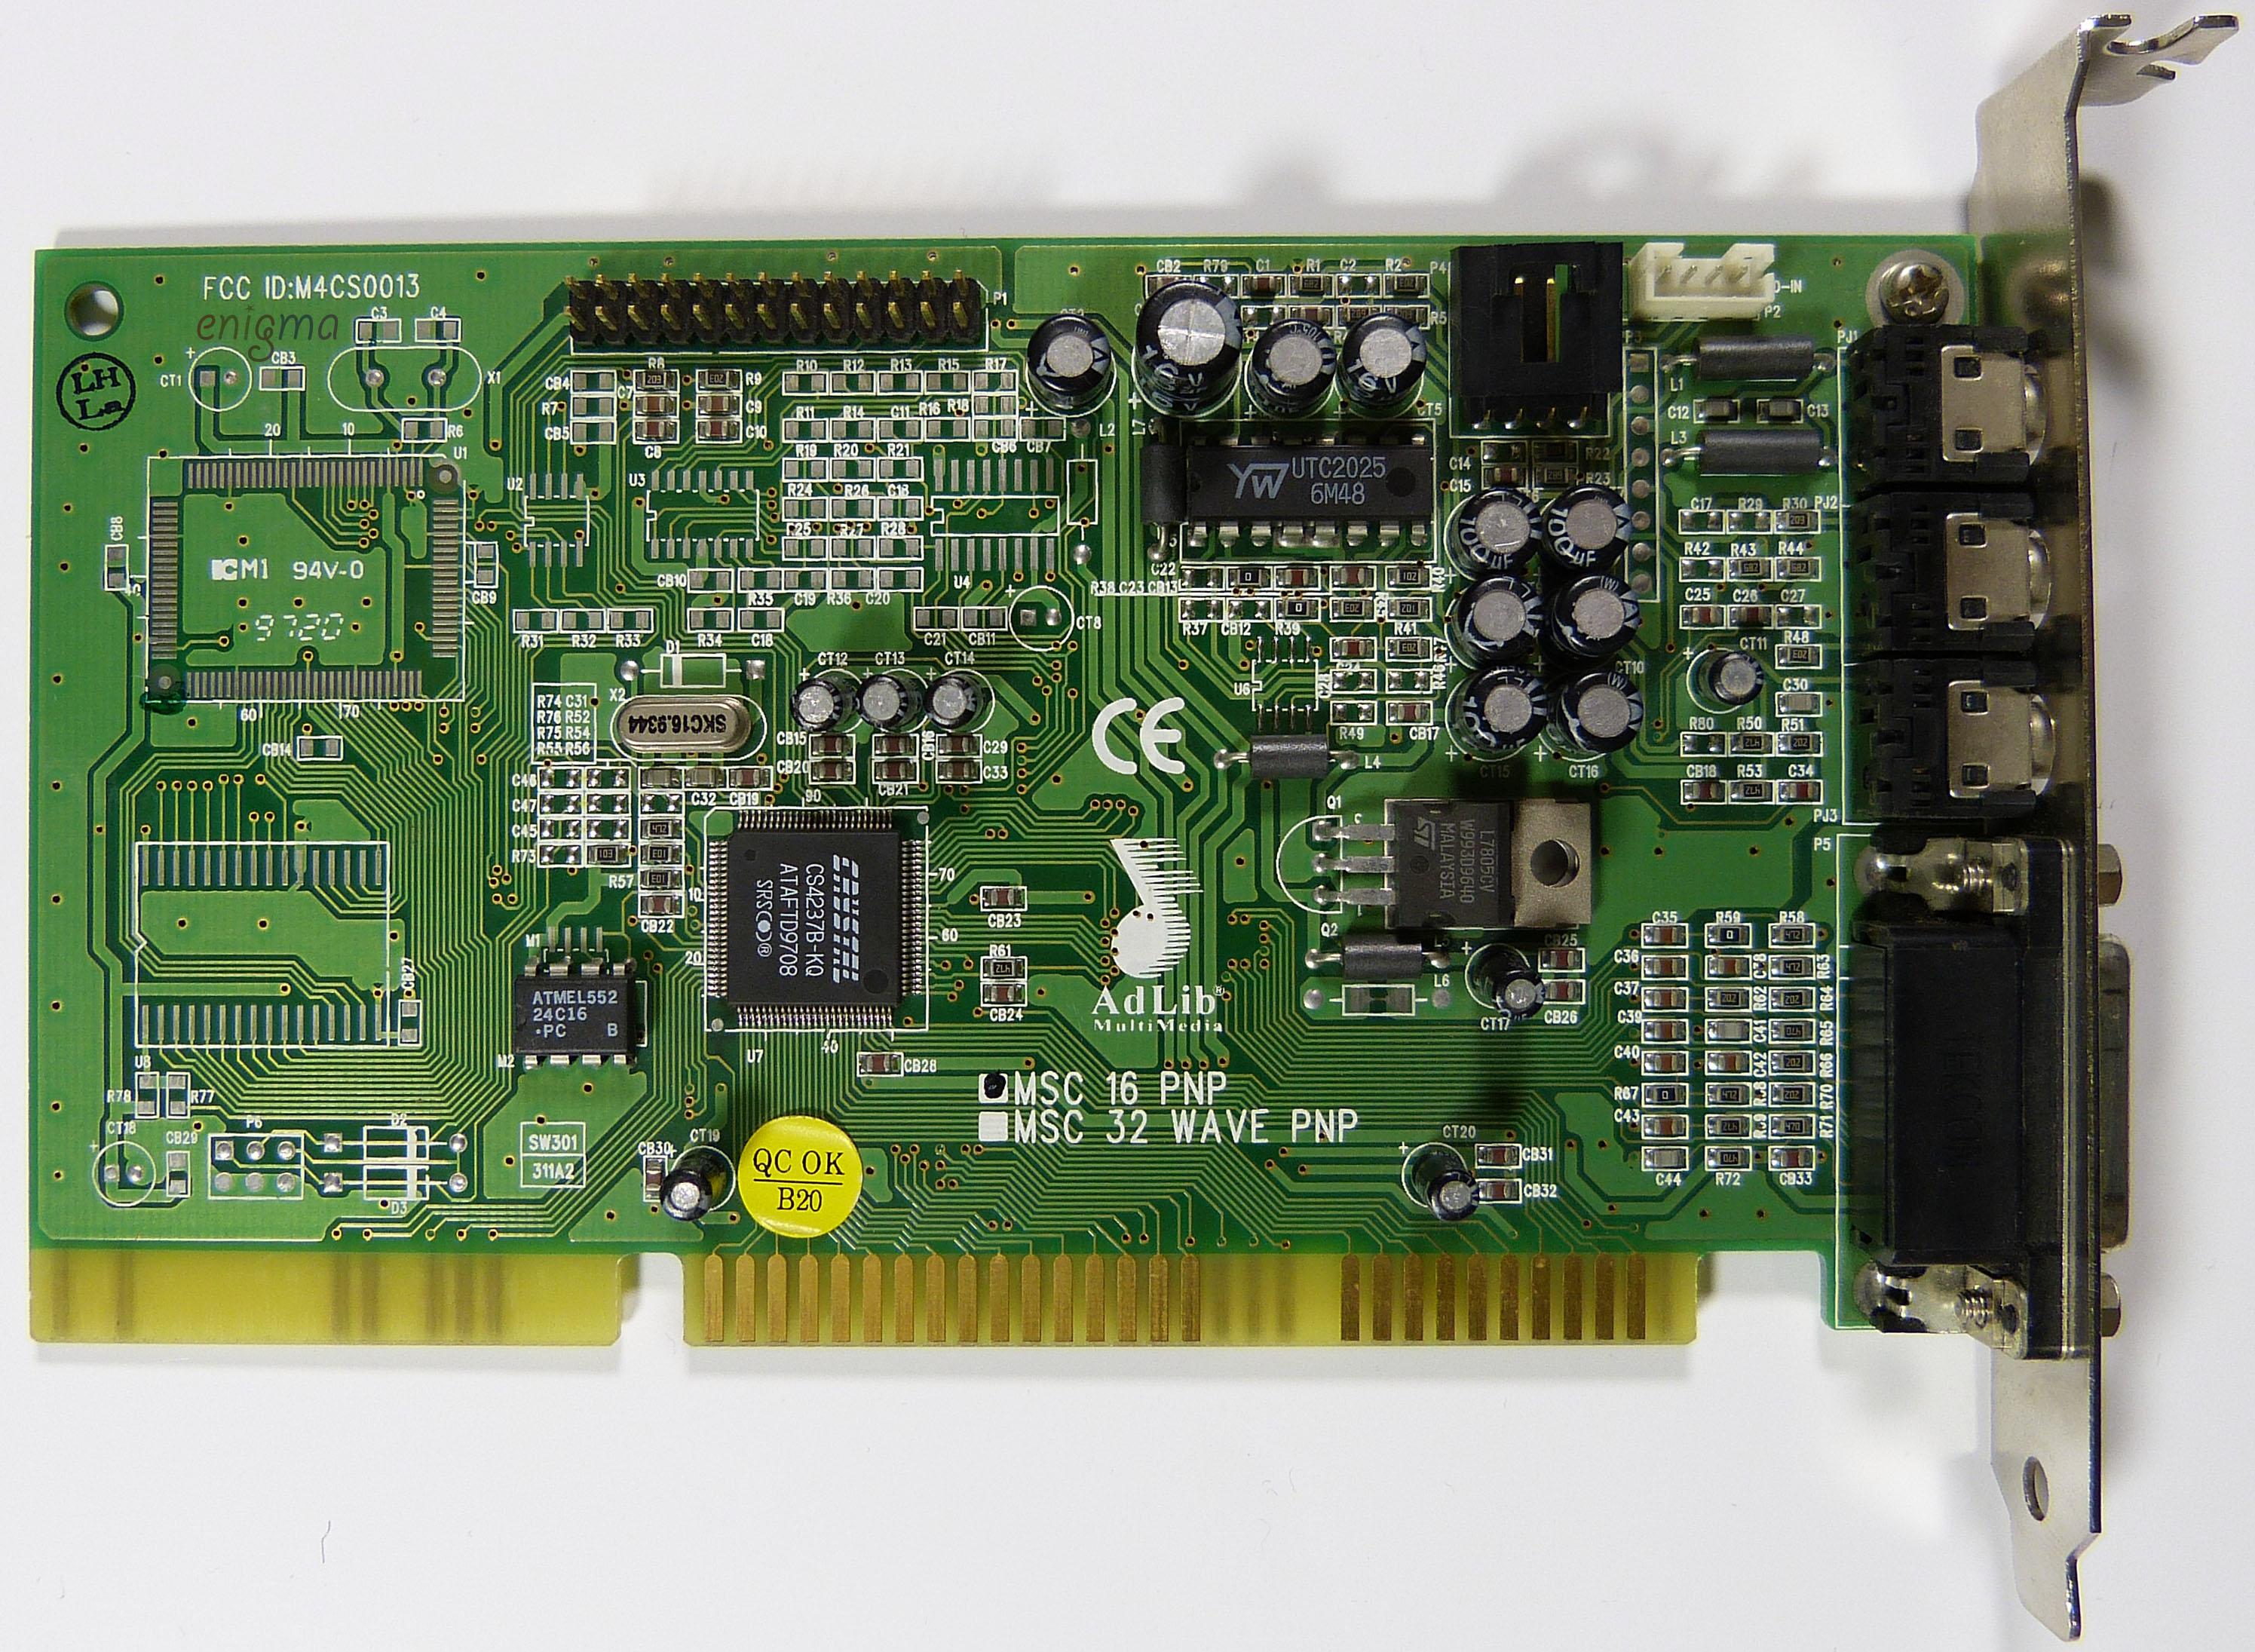 ADVANCE LOGIC MPU401 DEVICE DRIVERS FOR PC